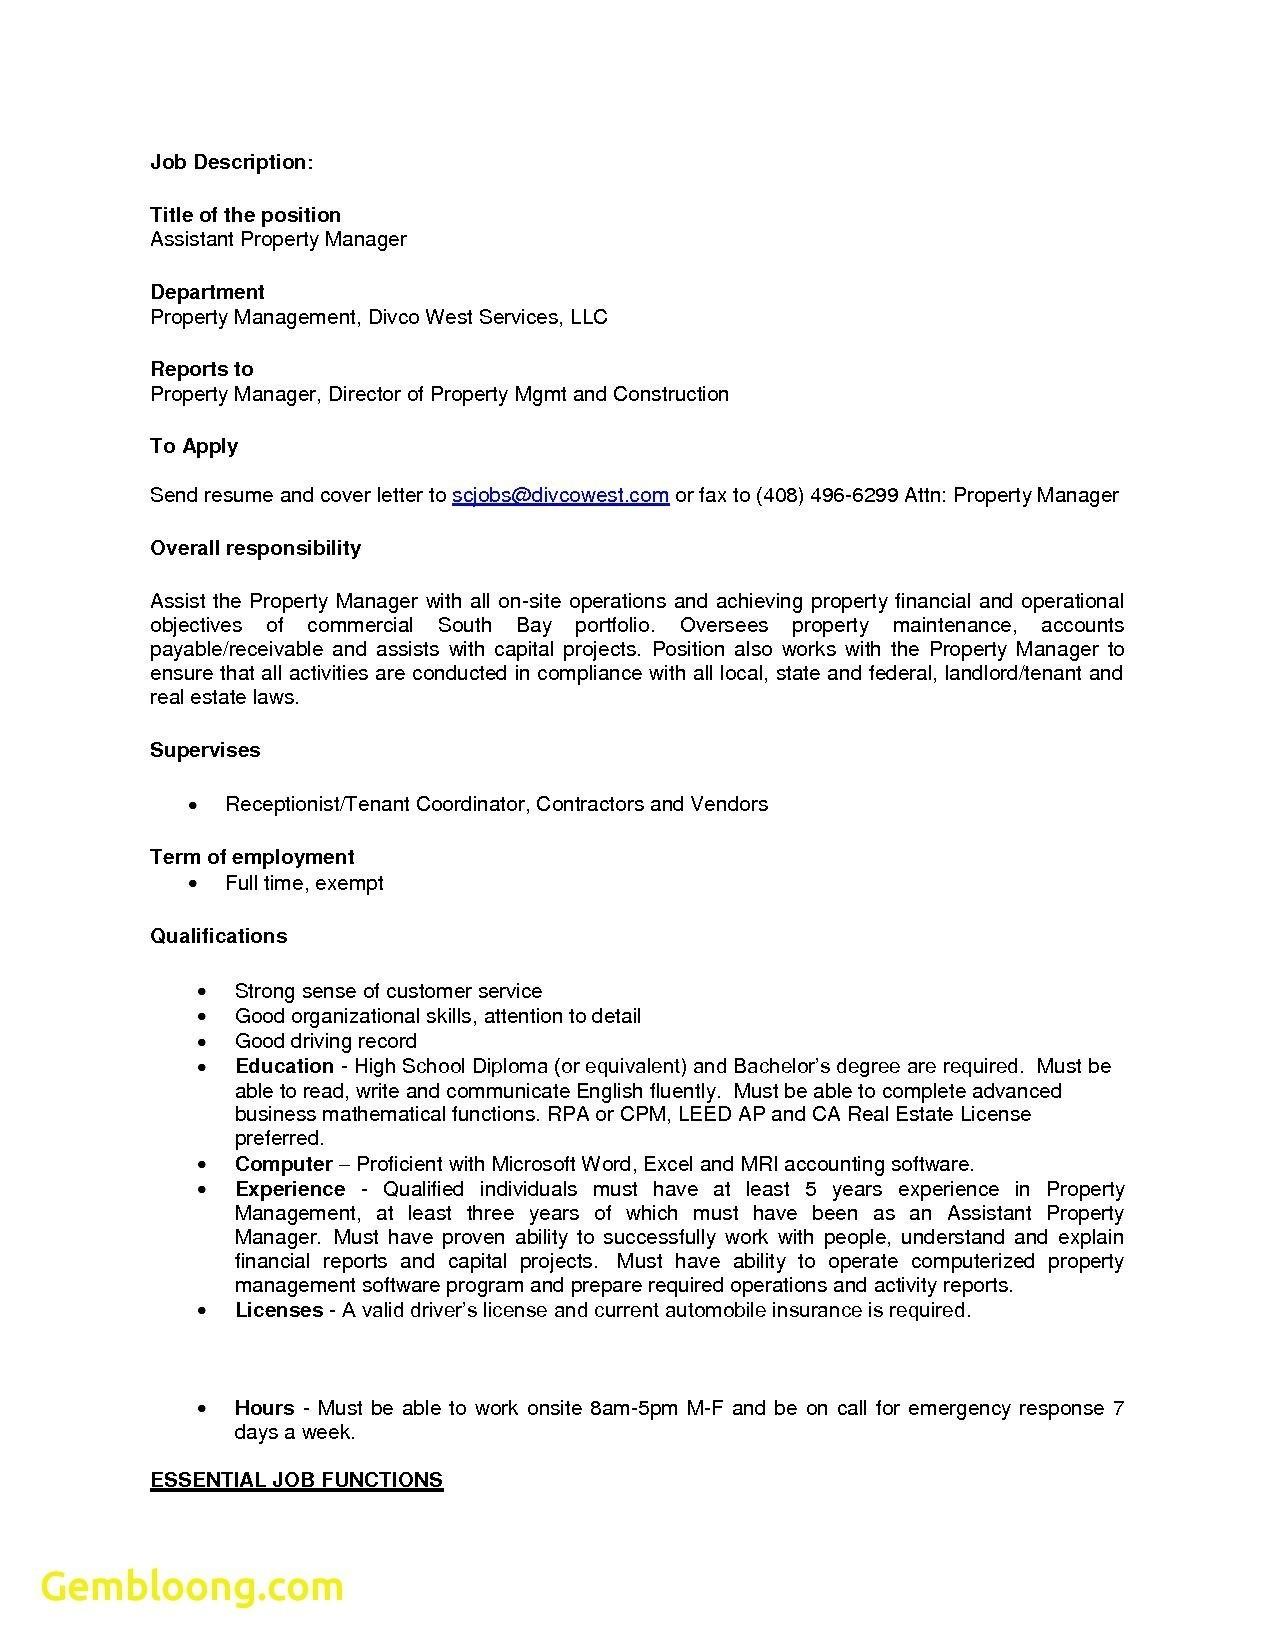 Real Estate Offer Letter Template - format Appointment Letter In Marathi Best Appointment Letter